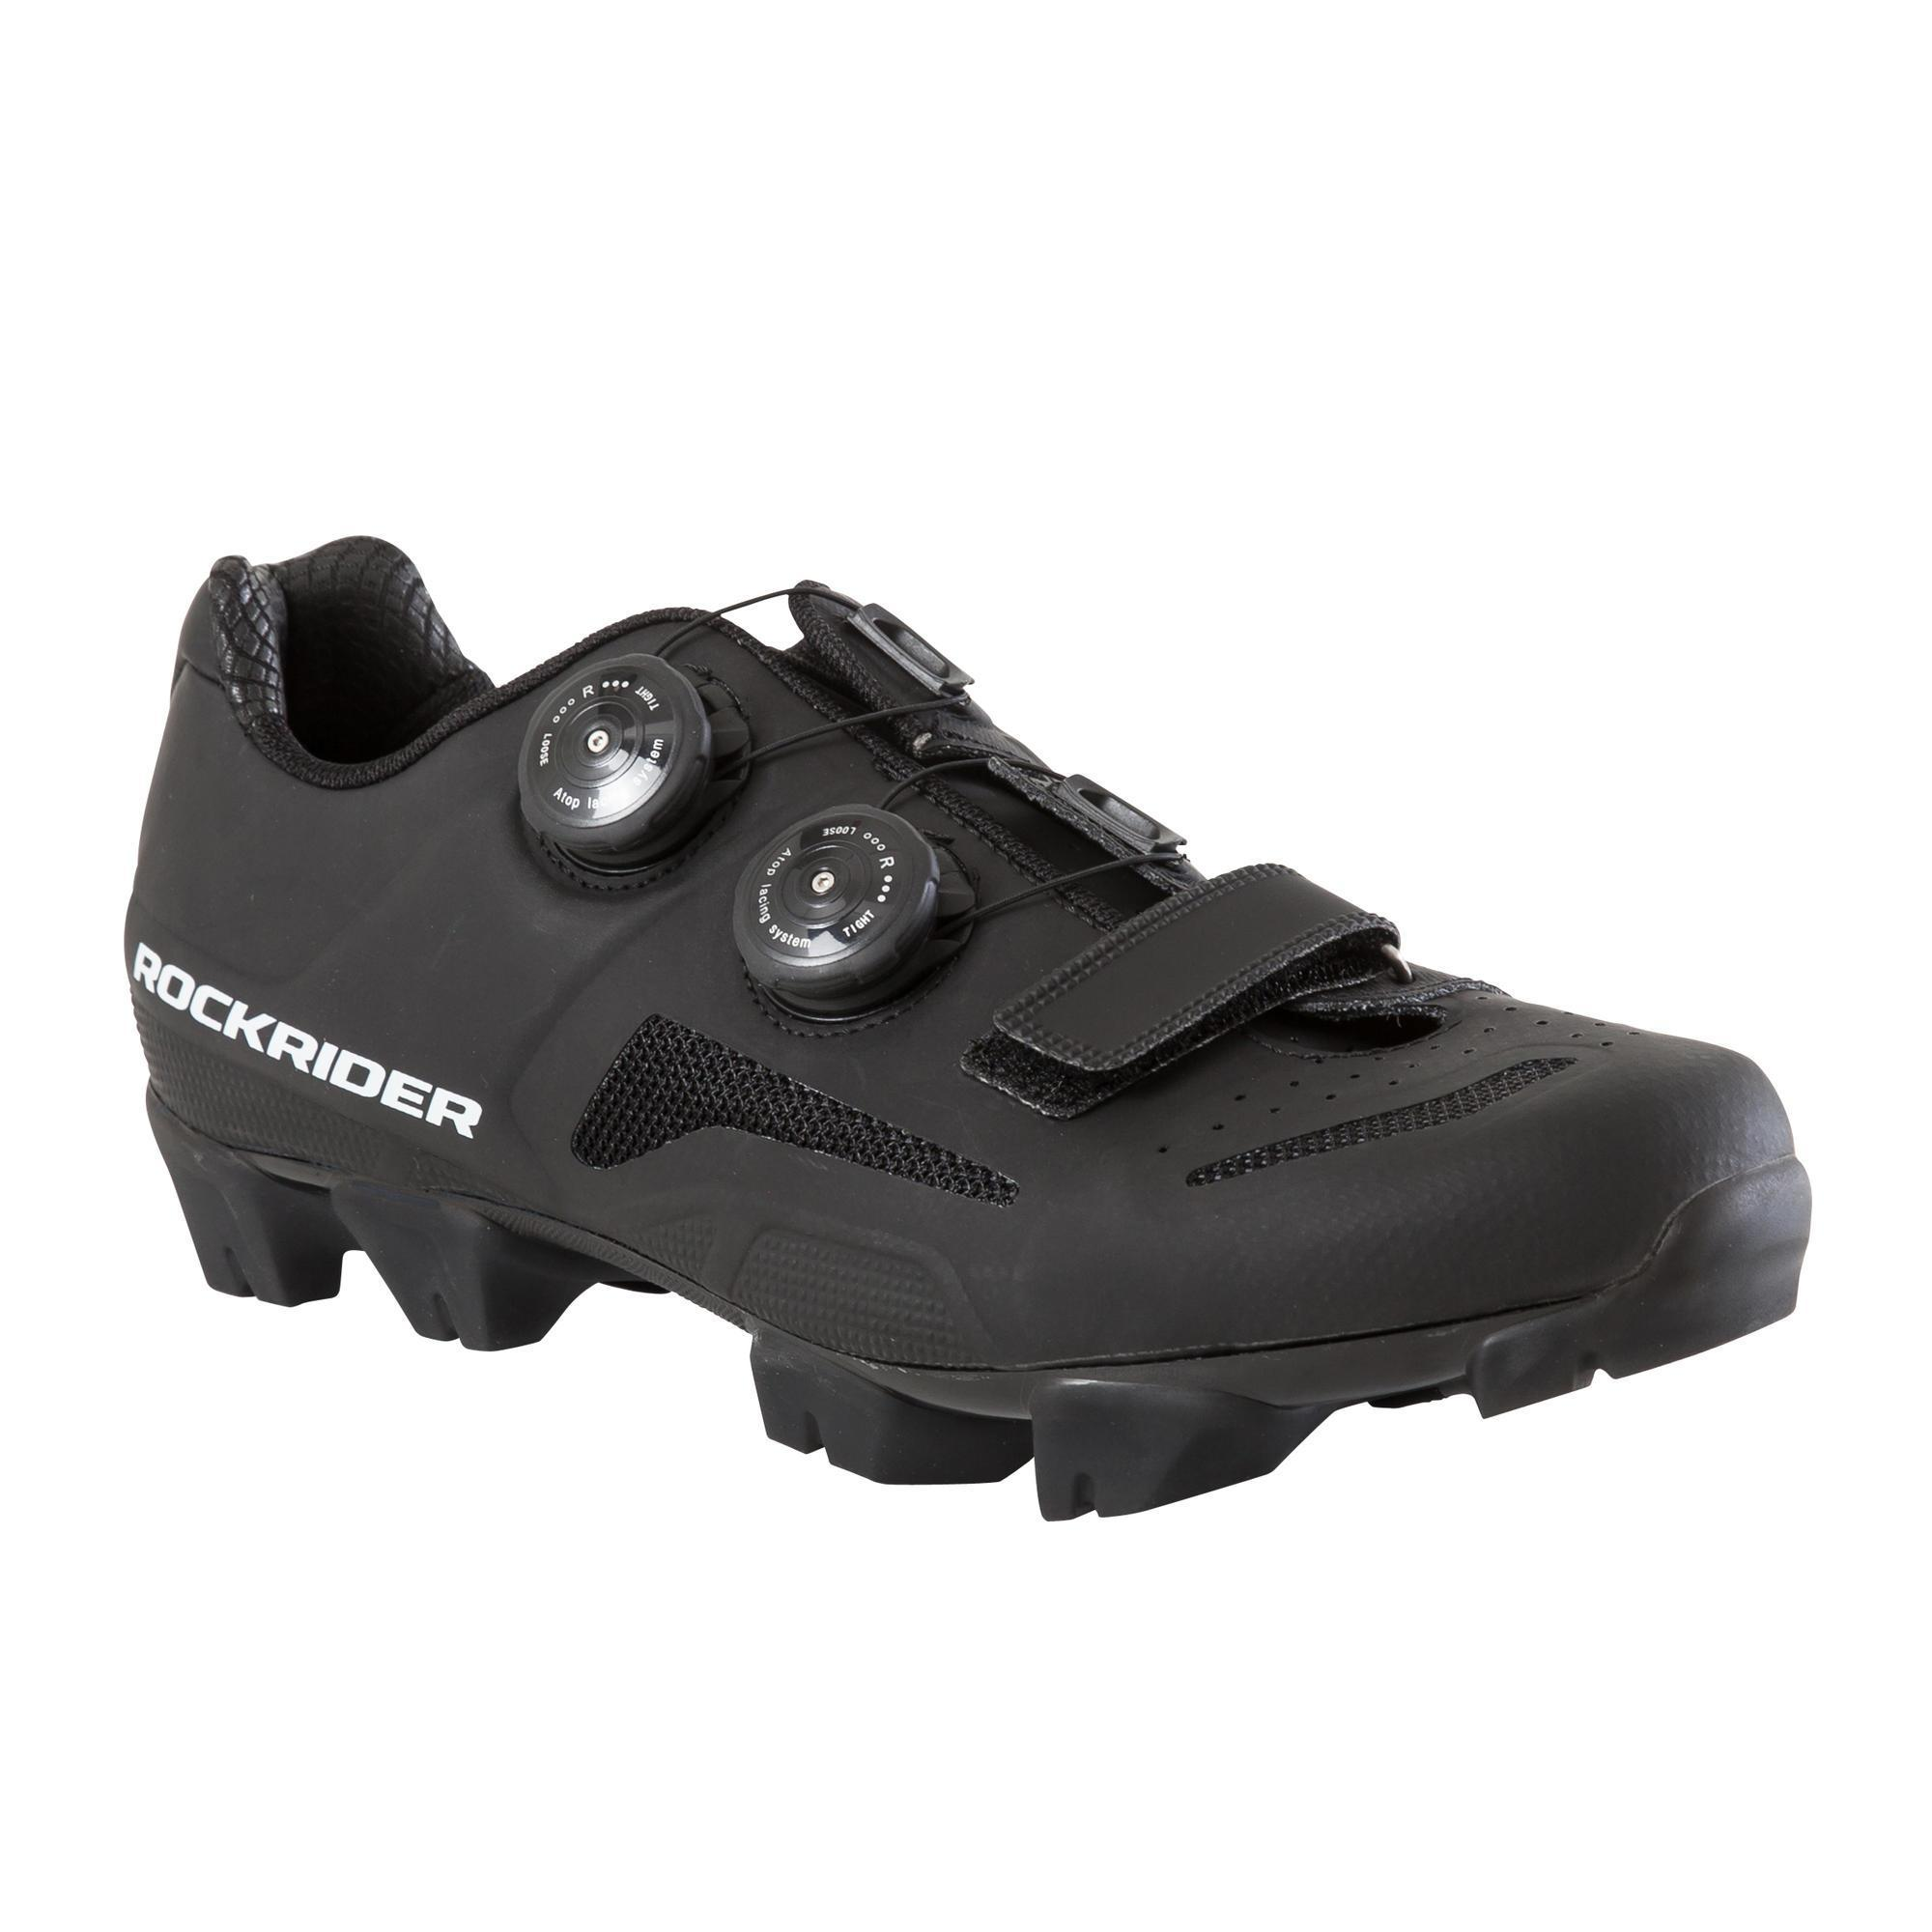 Rockrider MTB-schoenen XC 500